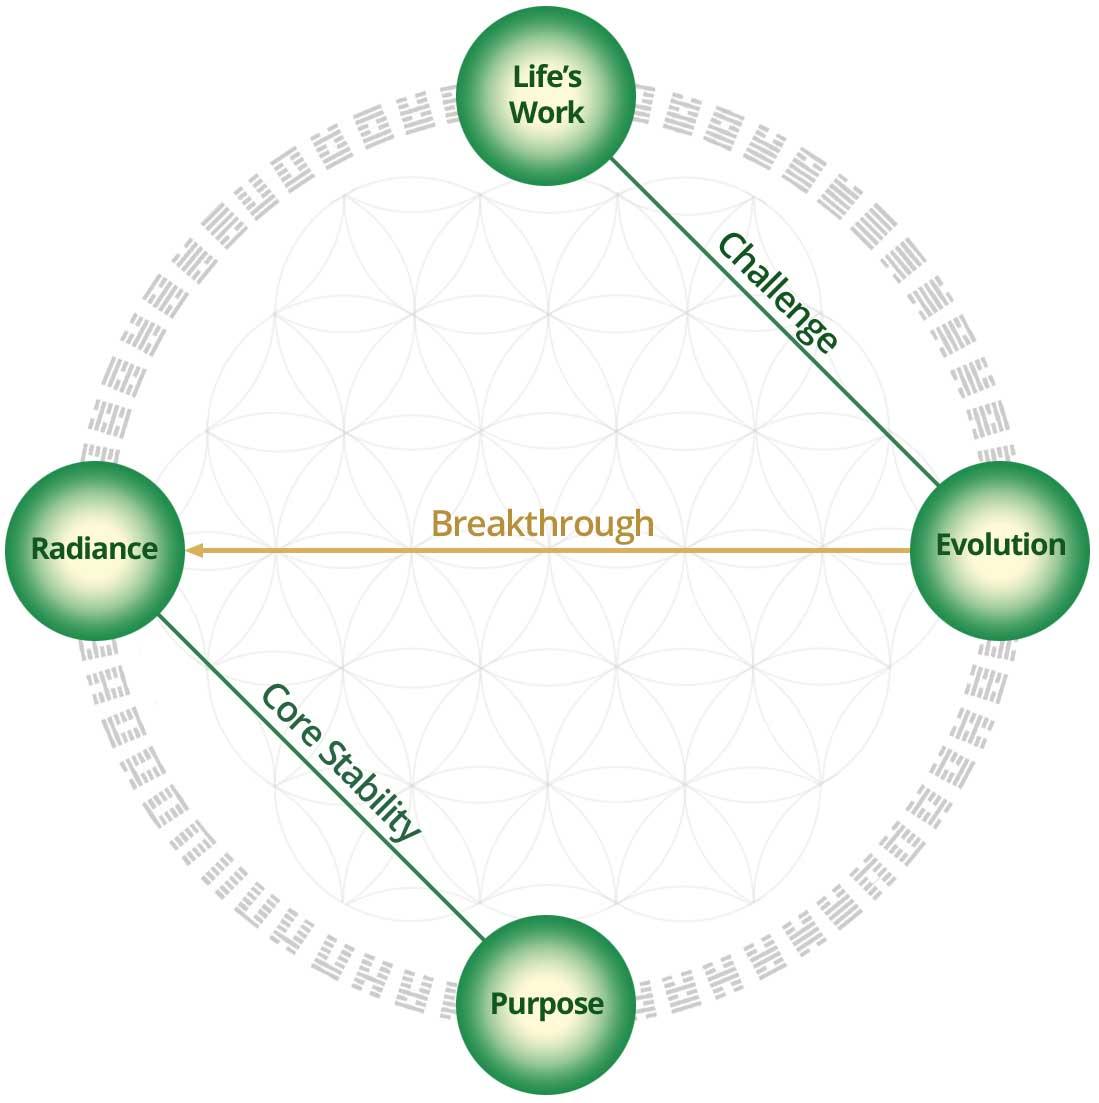 The Pathway of Breakthrough